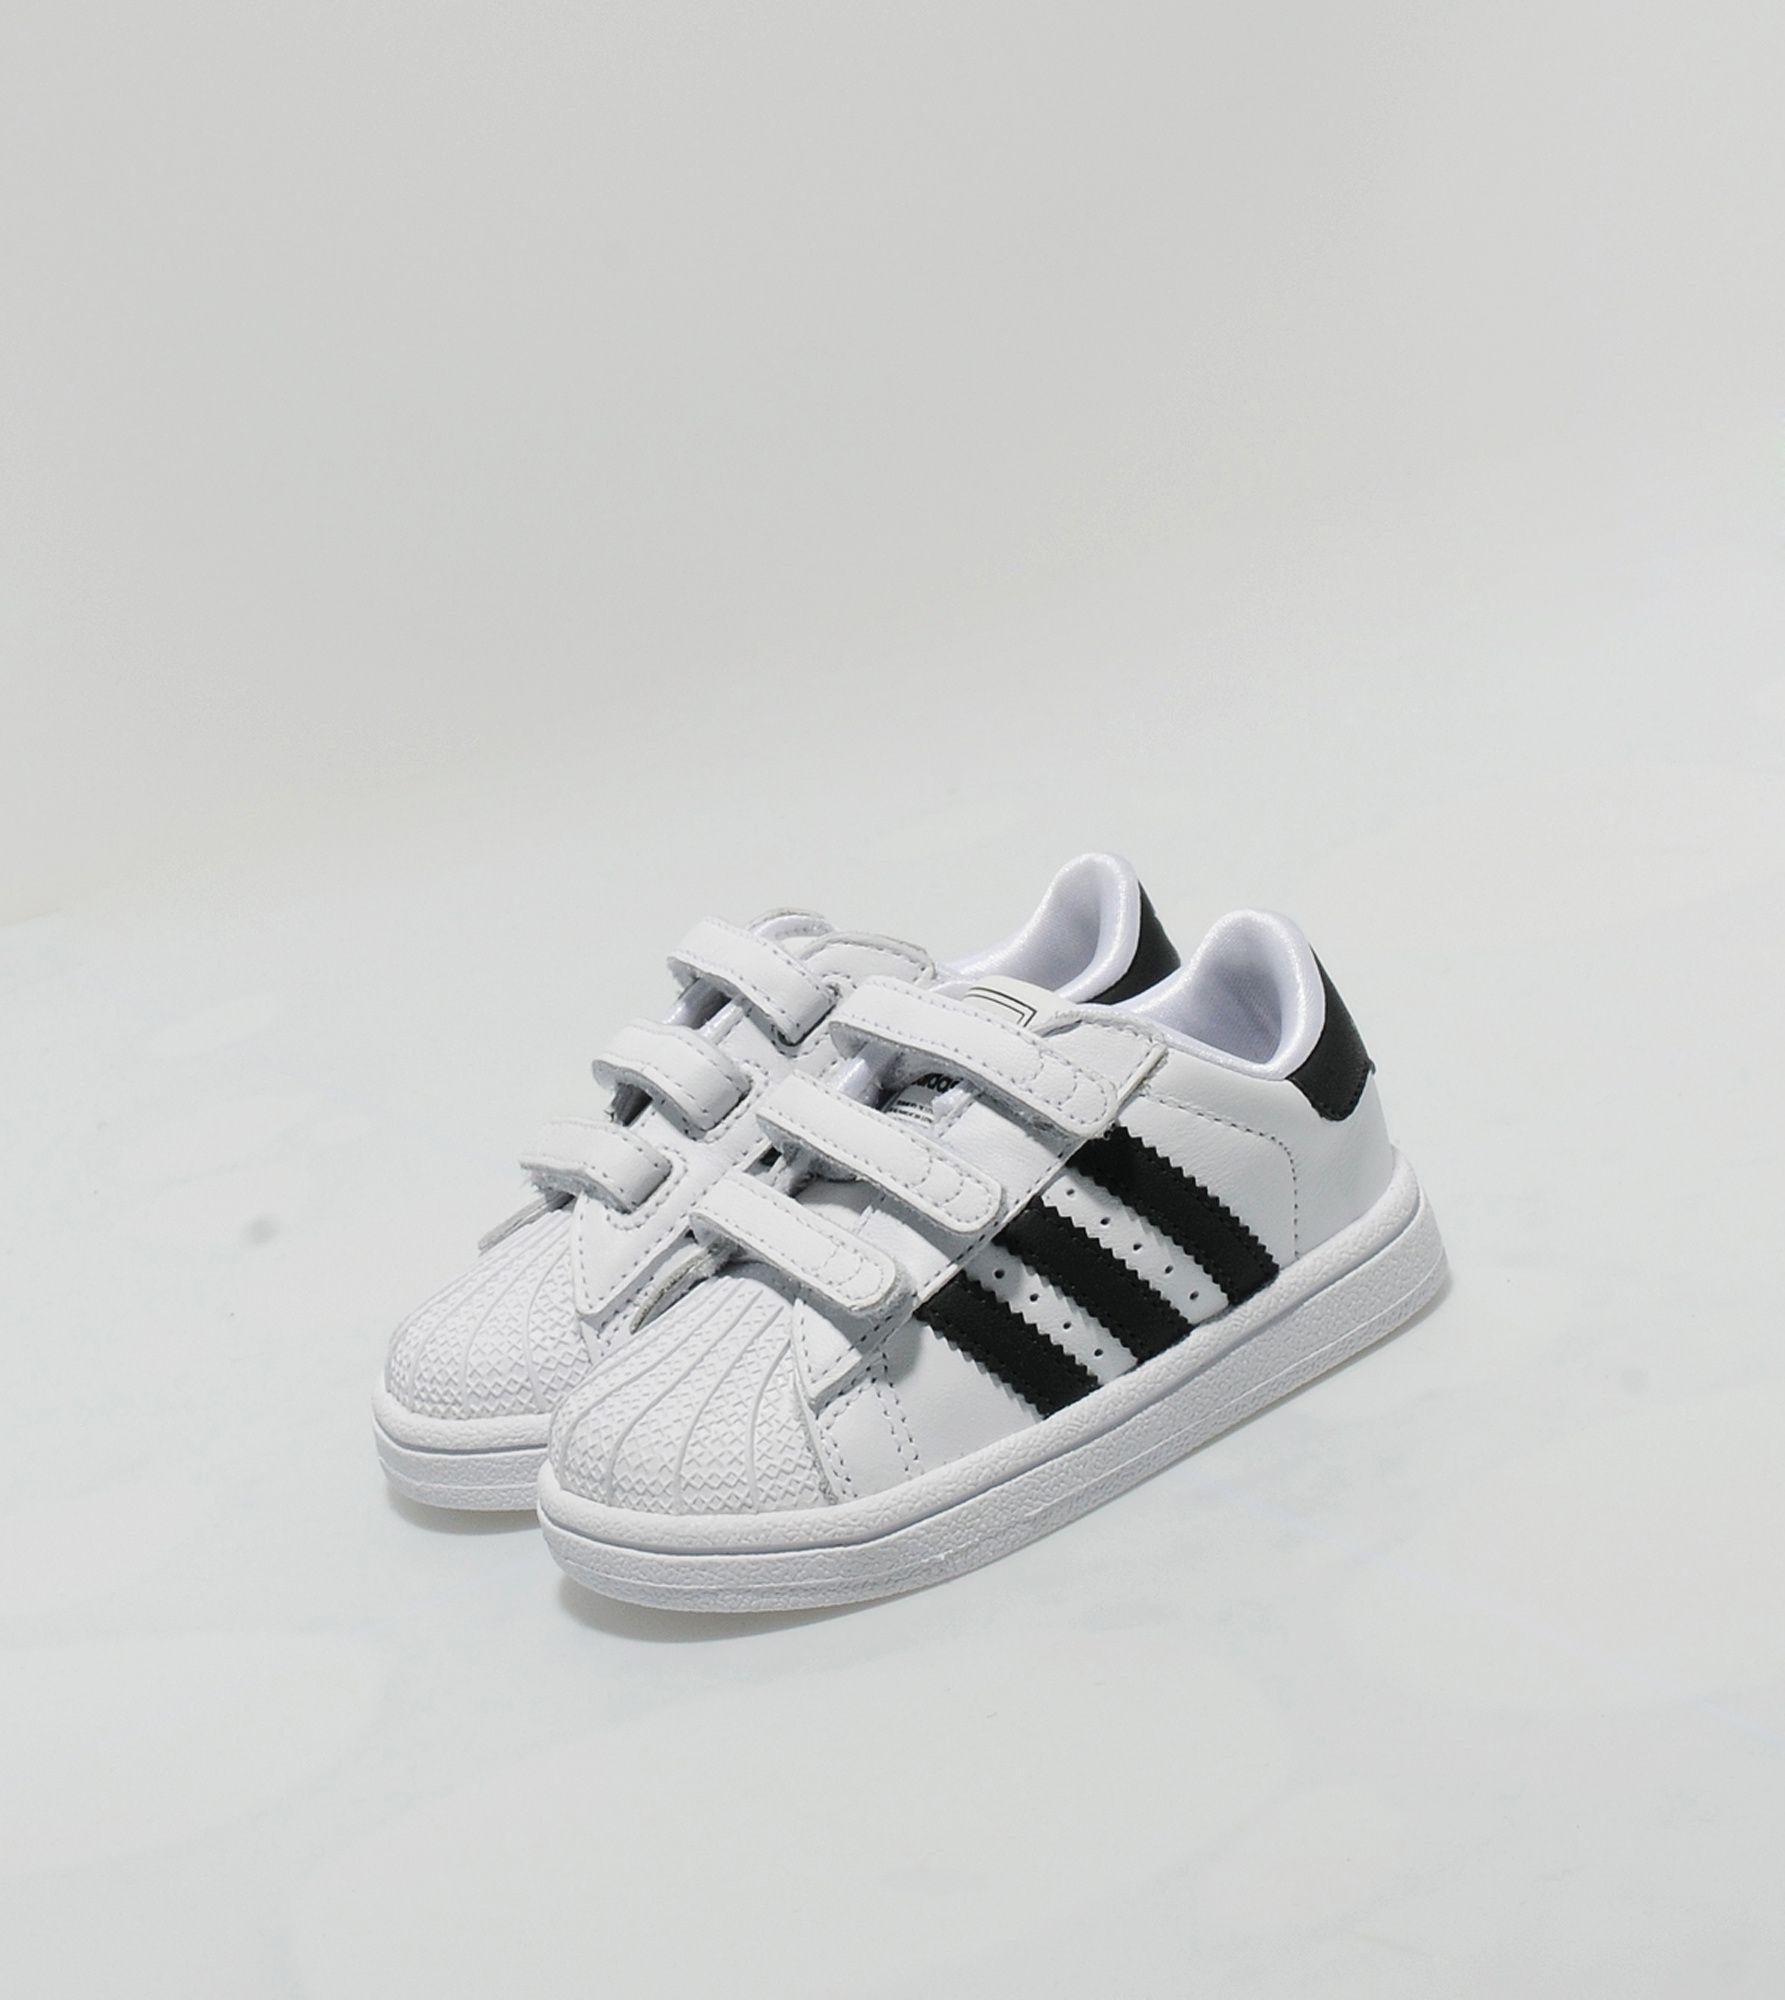 Adidas Originals Superstar Infant Size